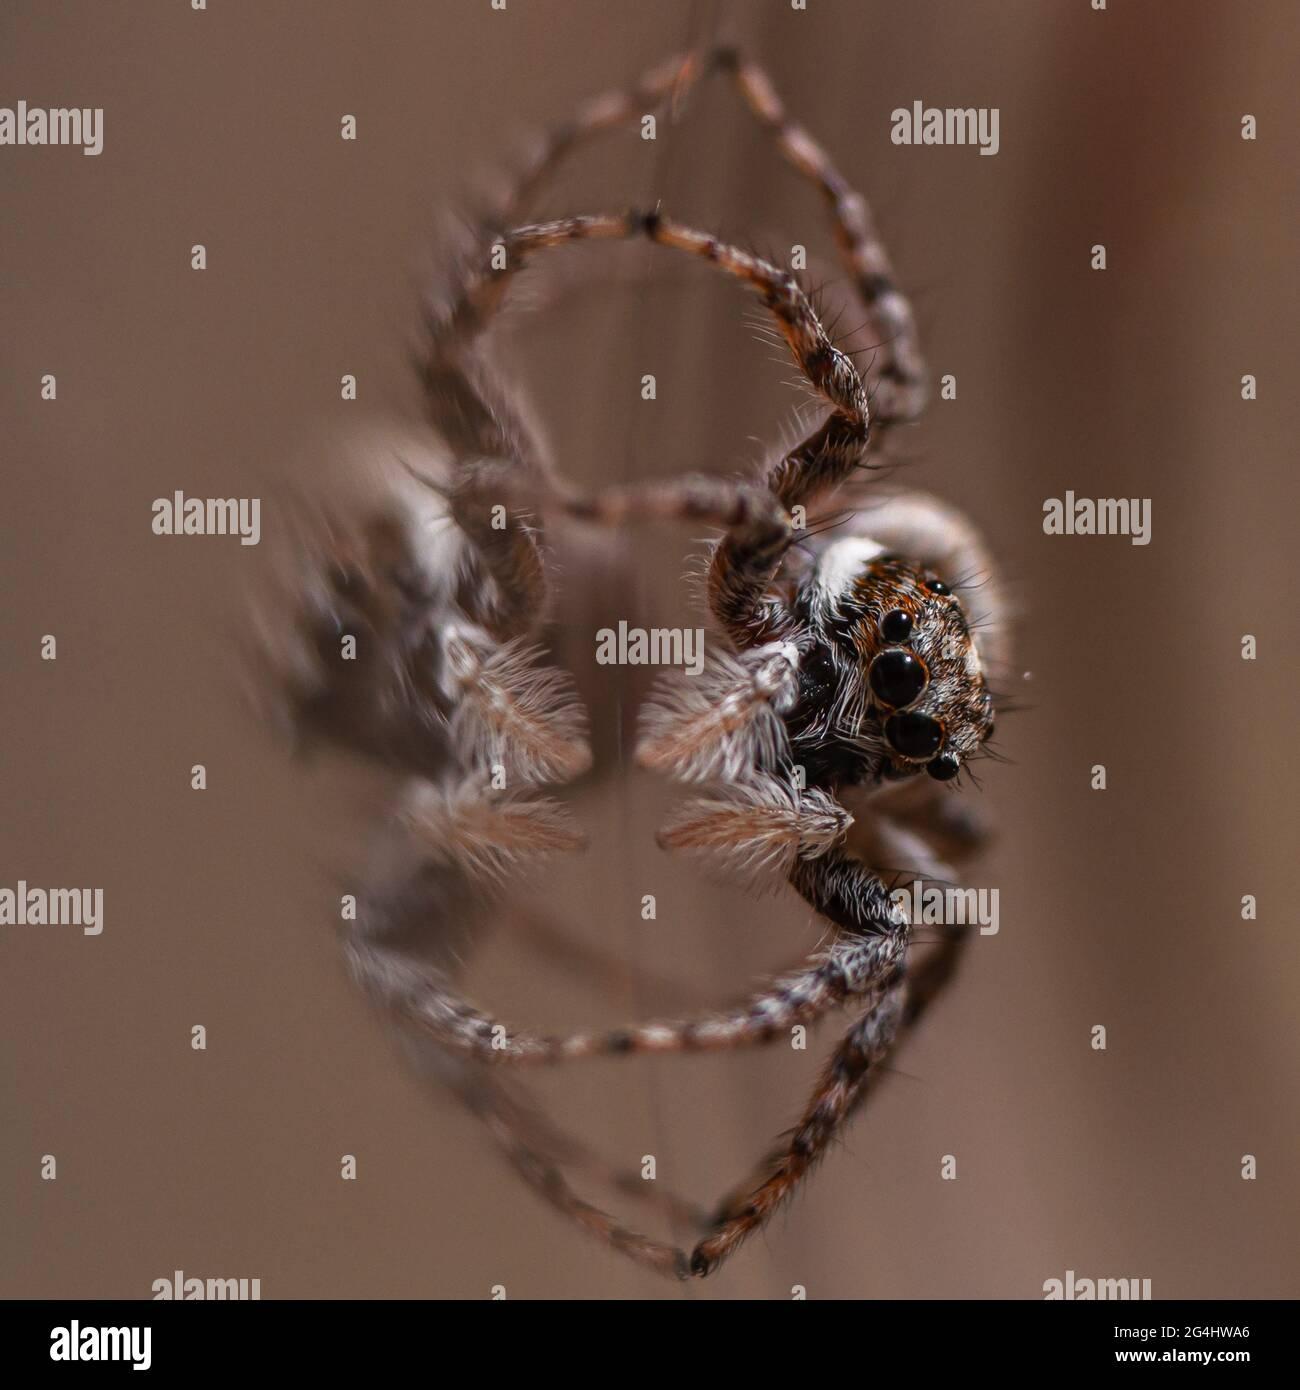 close-up of a Jumping spider Menemerus semilimbatus Stock Photo